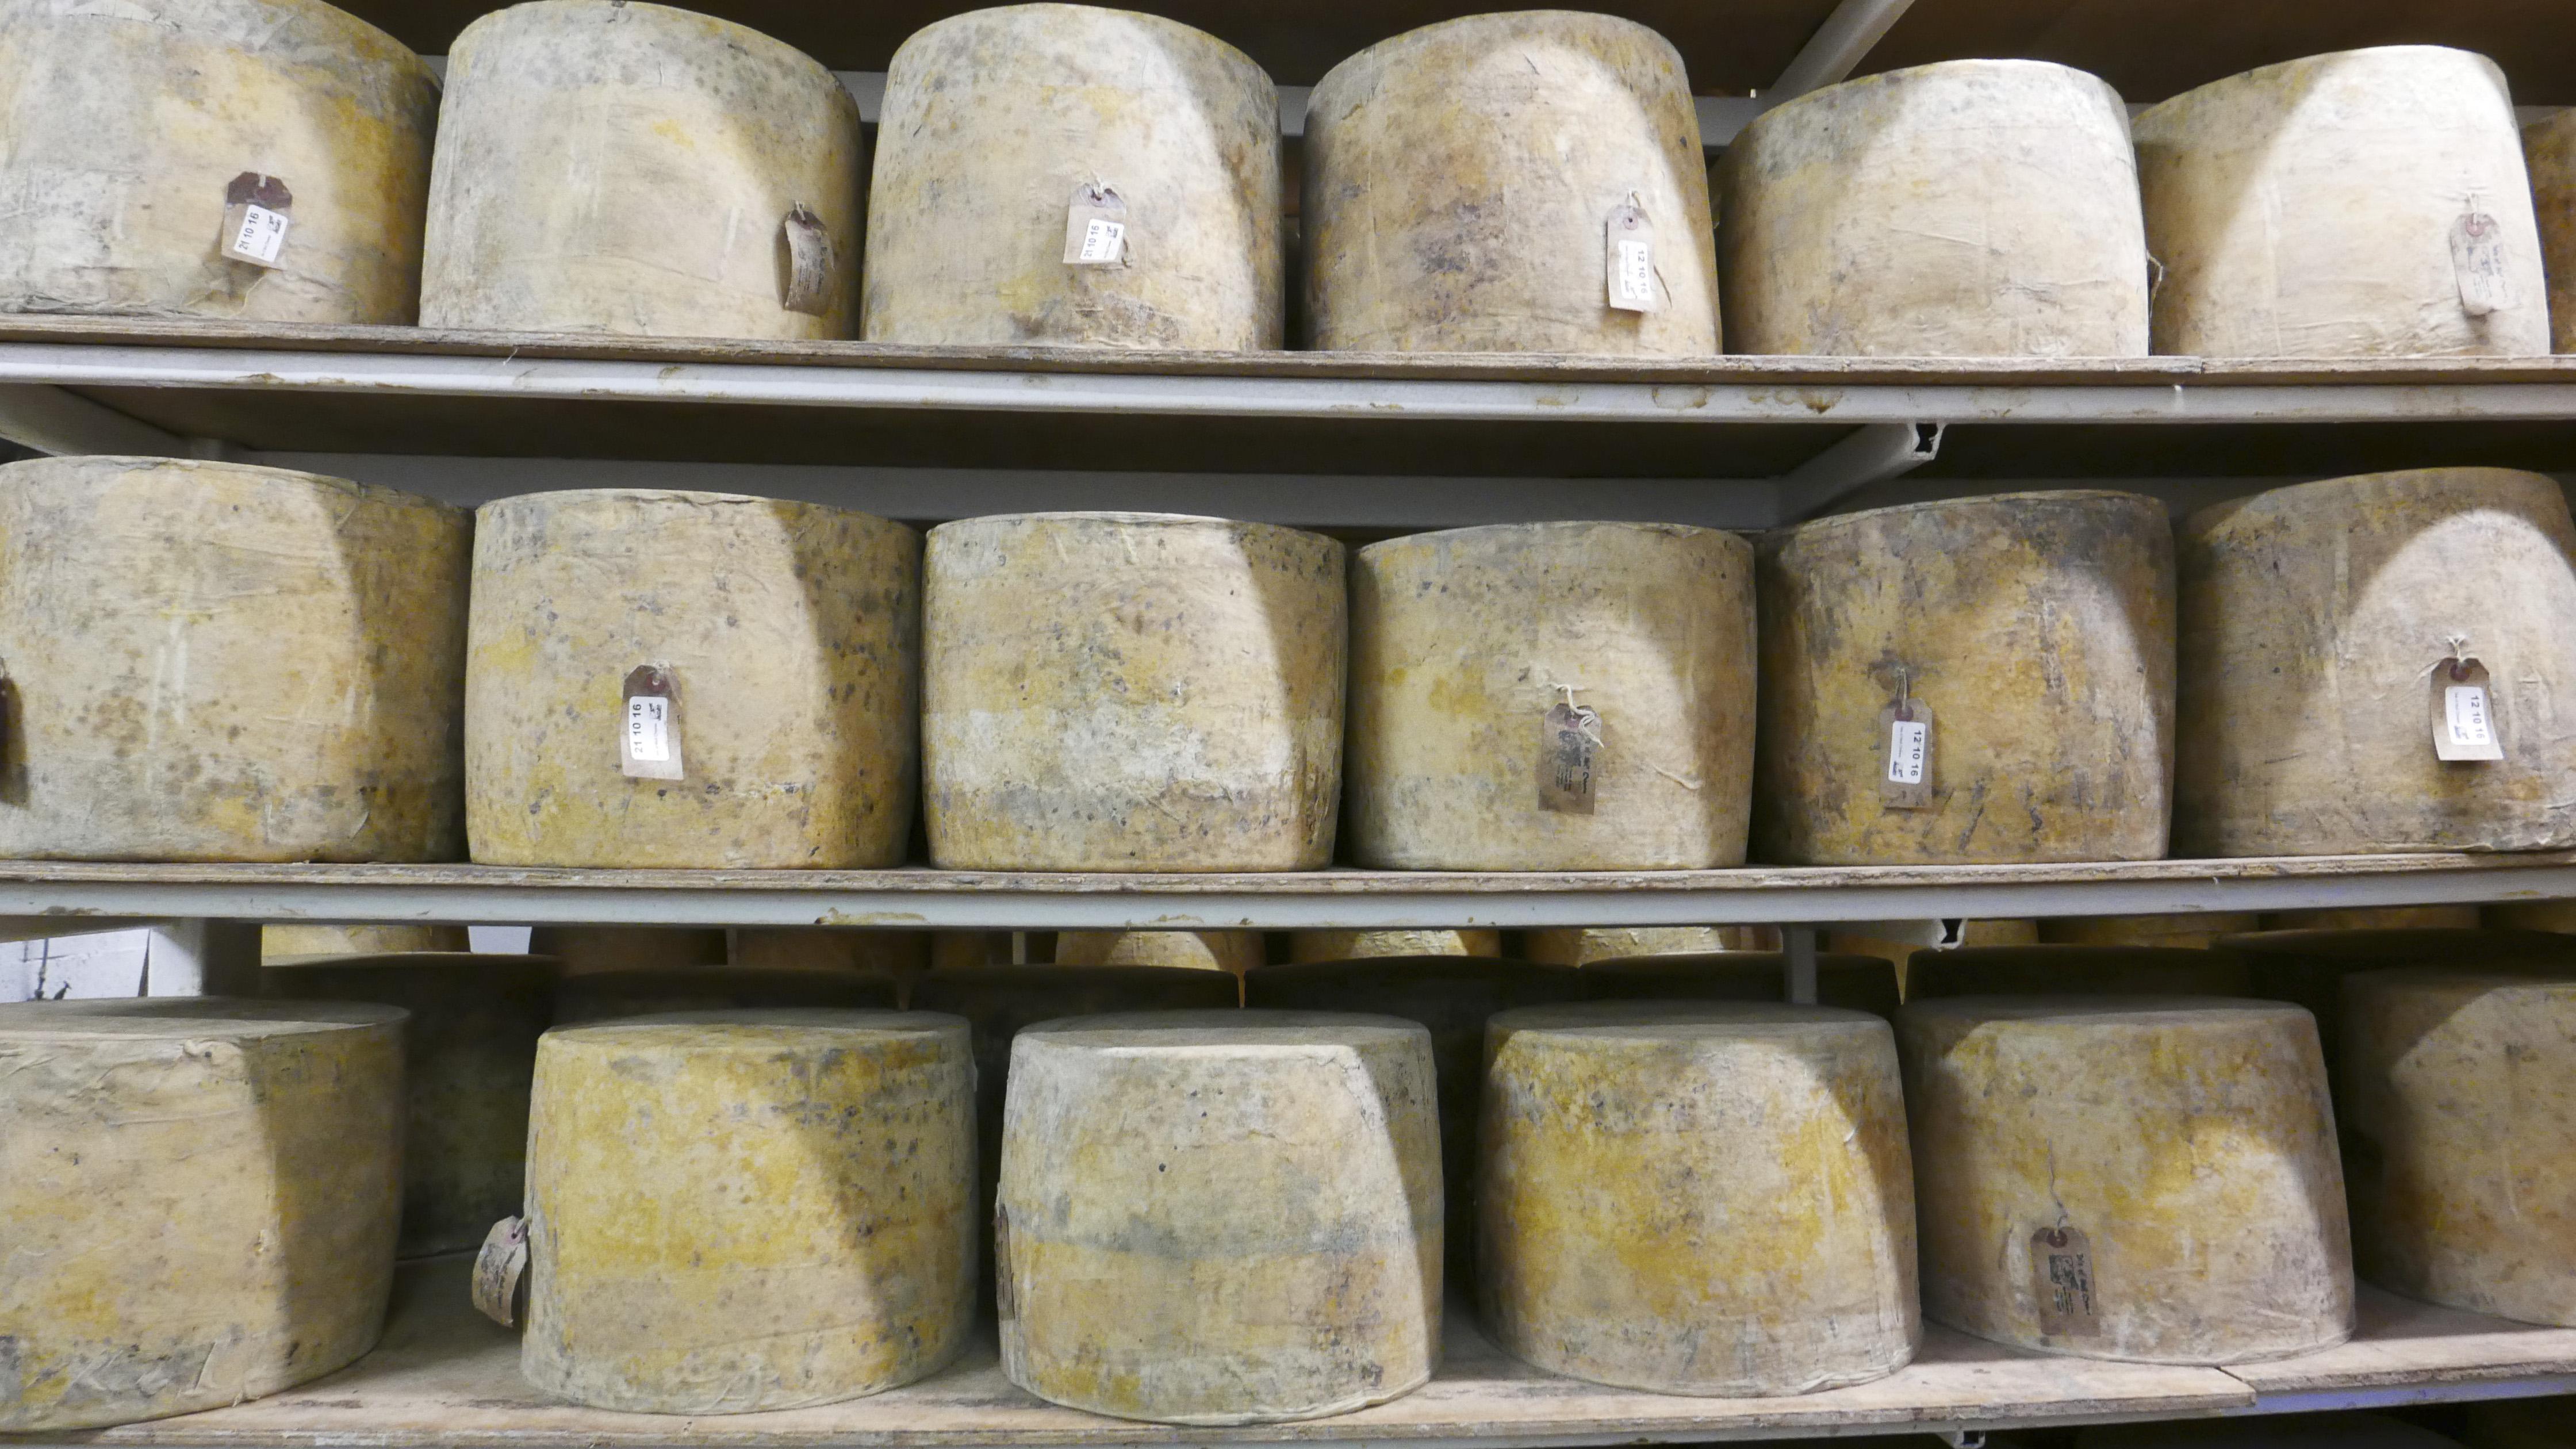 Isle of mull cheese at glass barn